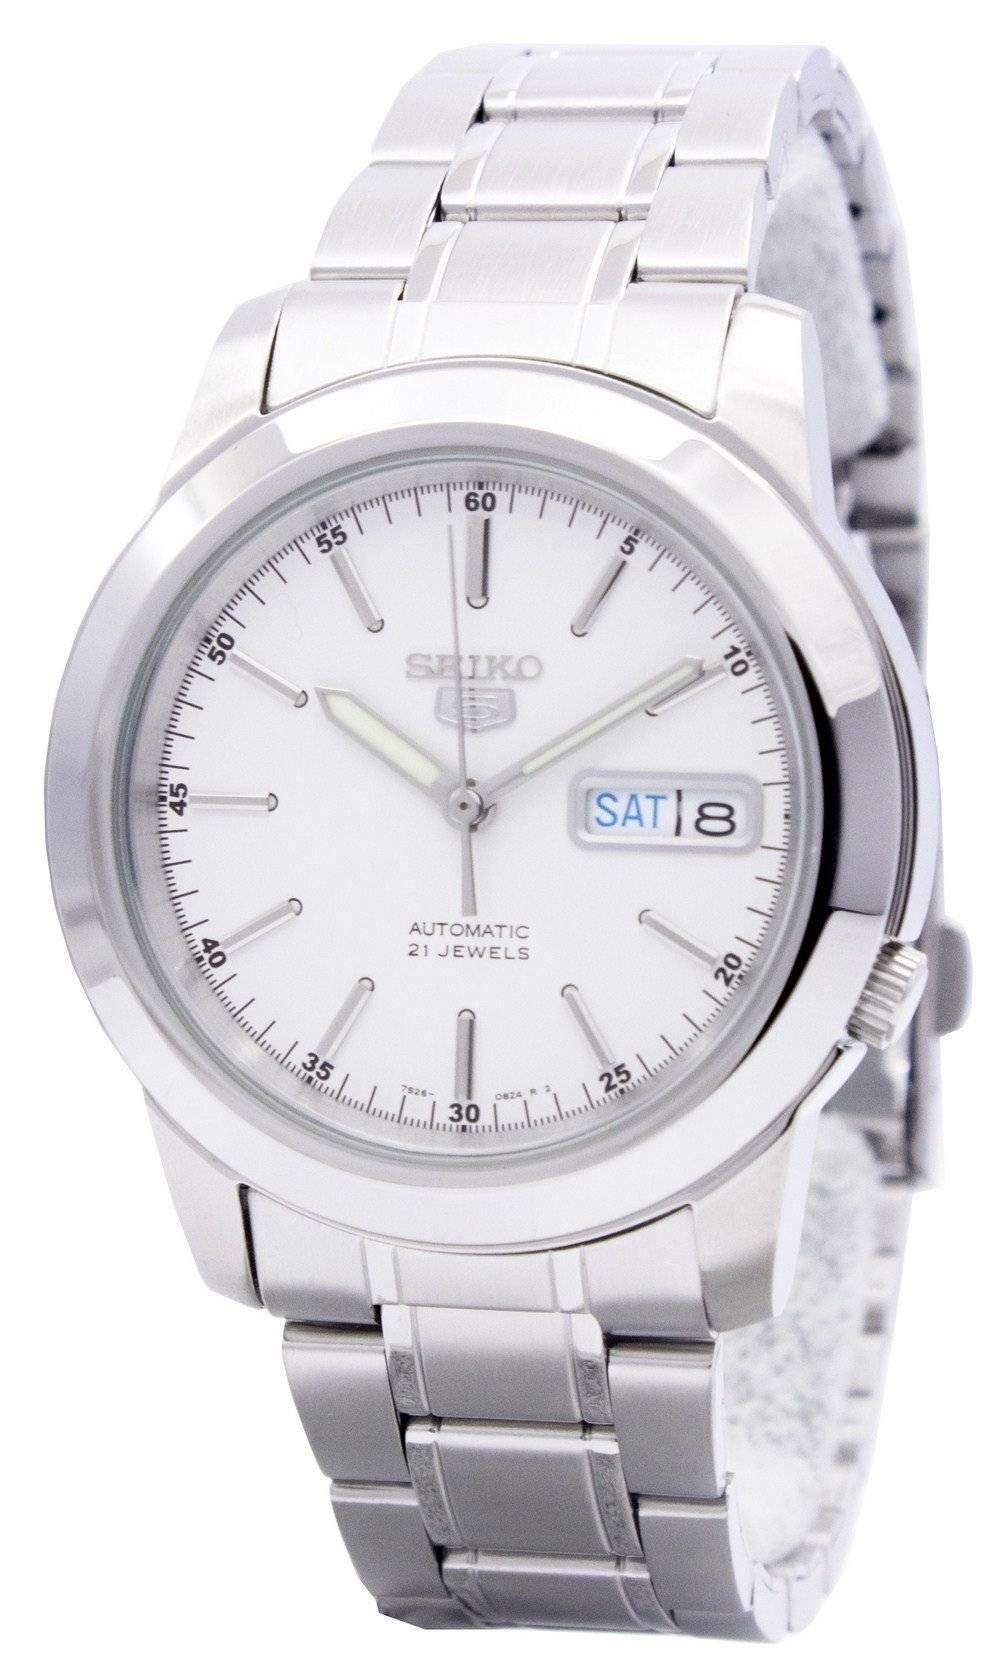 24dabc06729f Reloj de hombre Seiko 5 automático 21 joyas SNKE49 SNKE49K1 SNKE49K ...